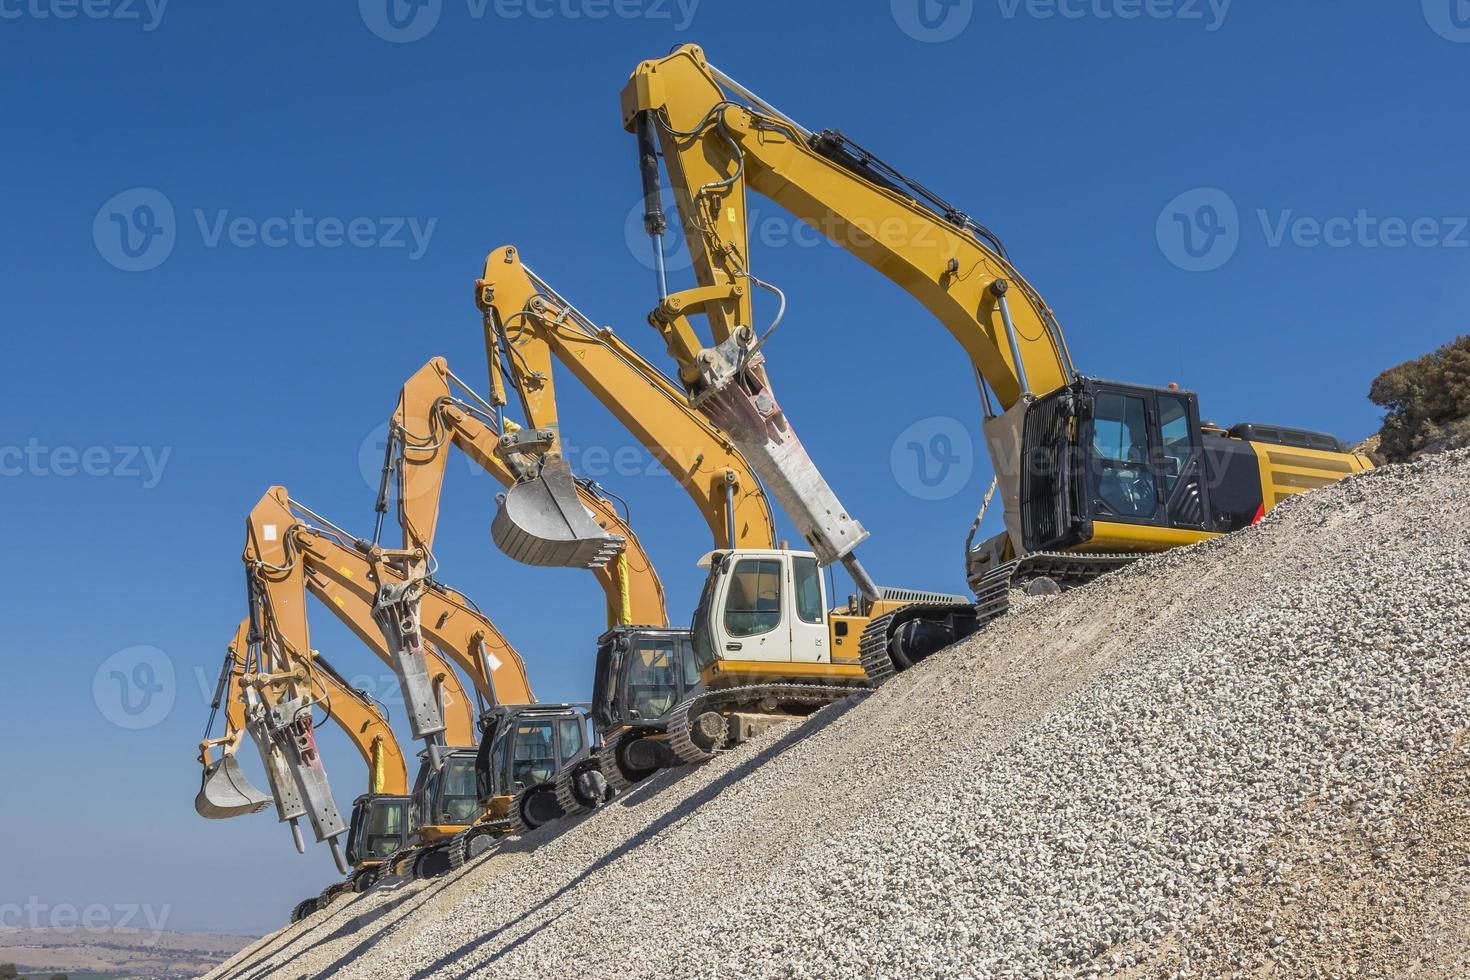 espectacular grupo de excavadoras foto